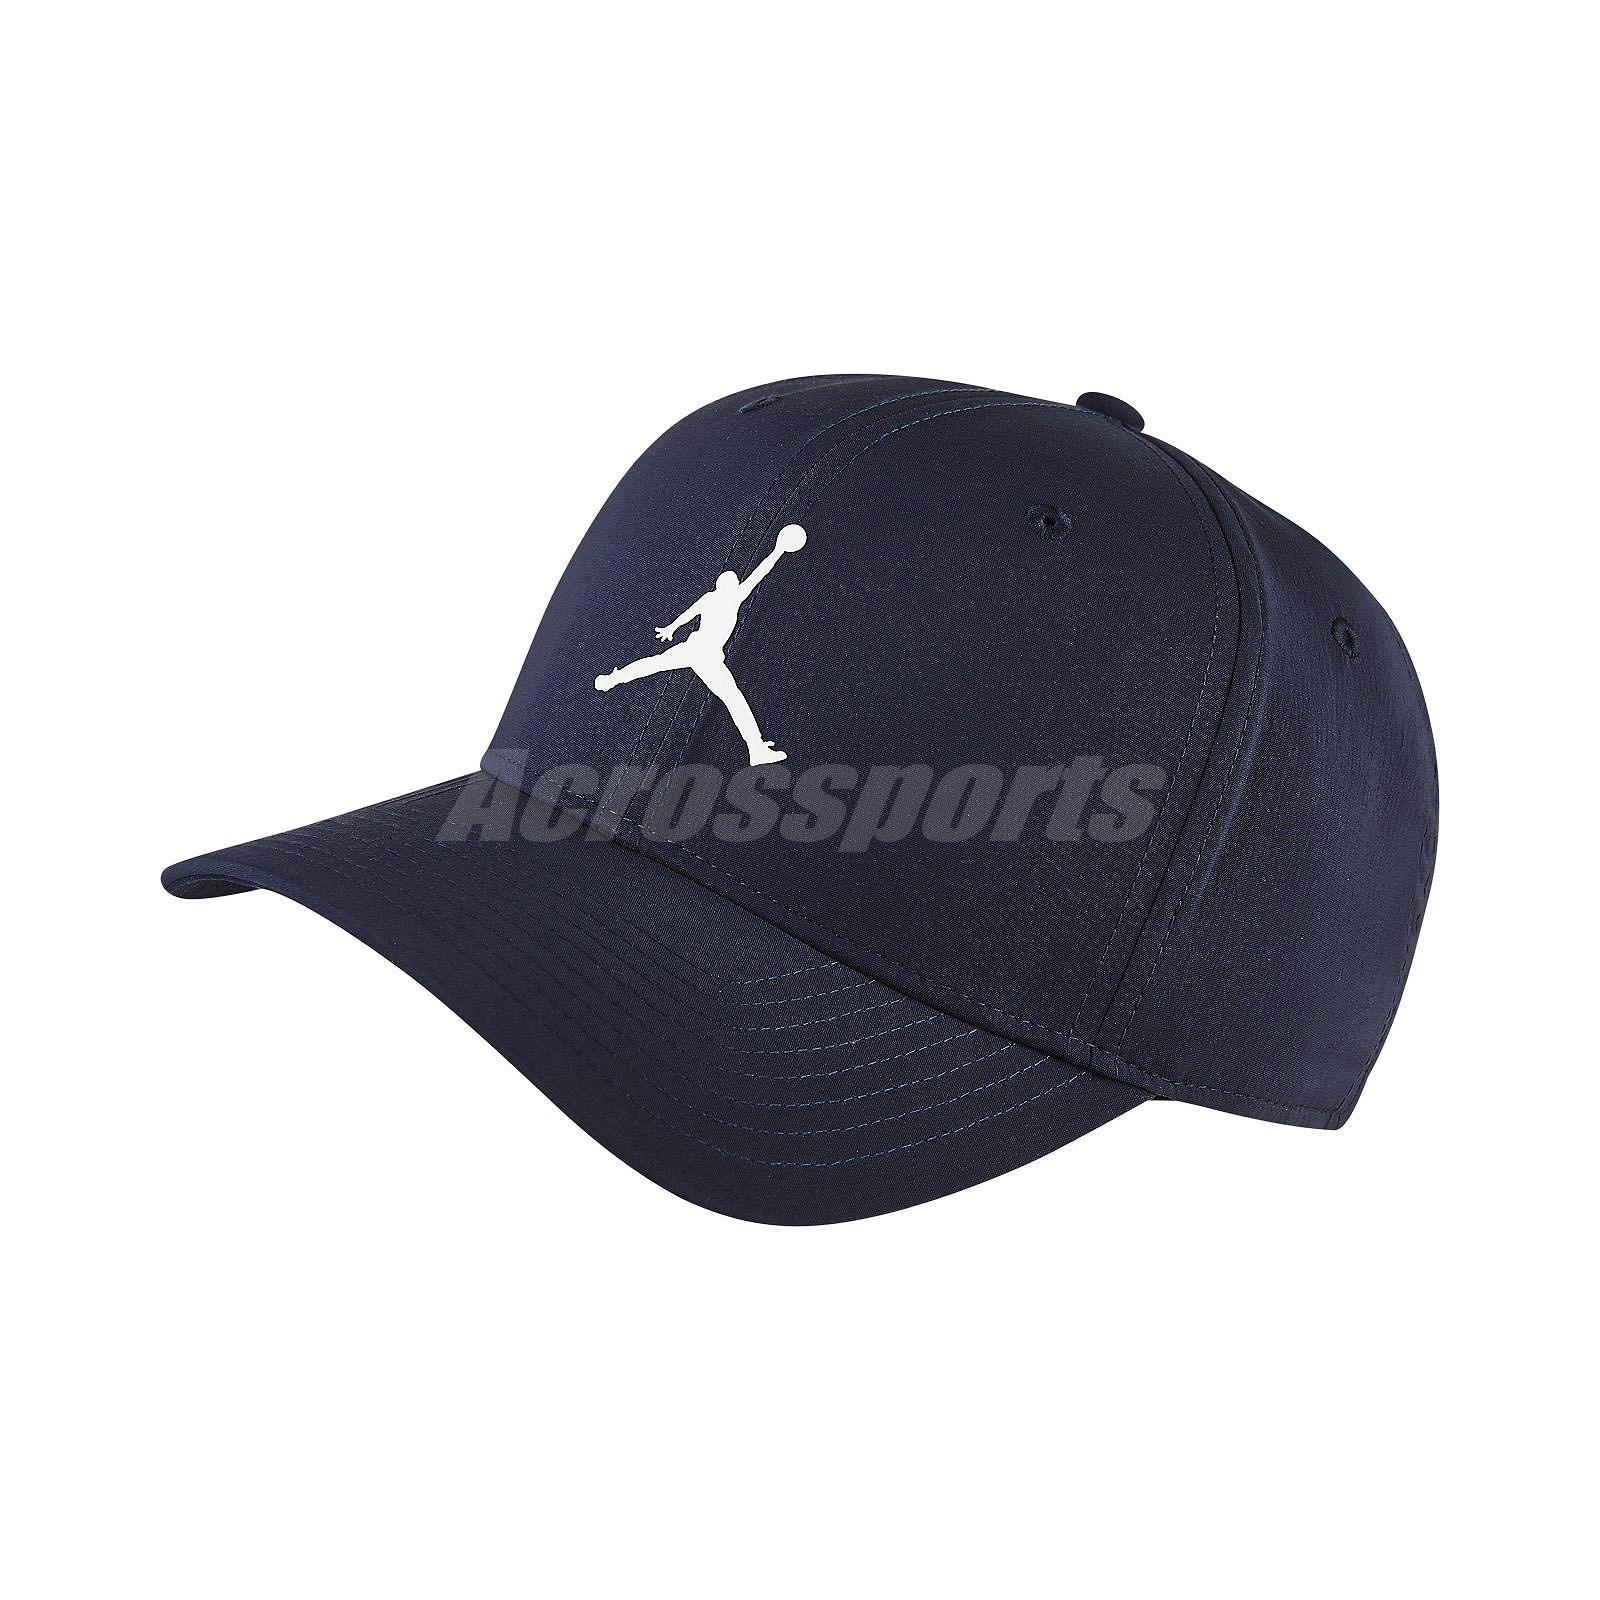 5e20048f78513 Details about Nike Air Jordan Classic 99 Snapback Baseball Cap Jumpman  Sports Navy AV8439-451